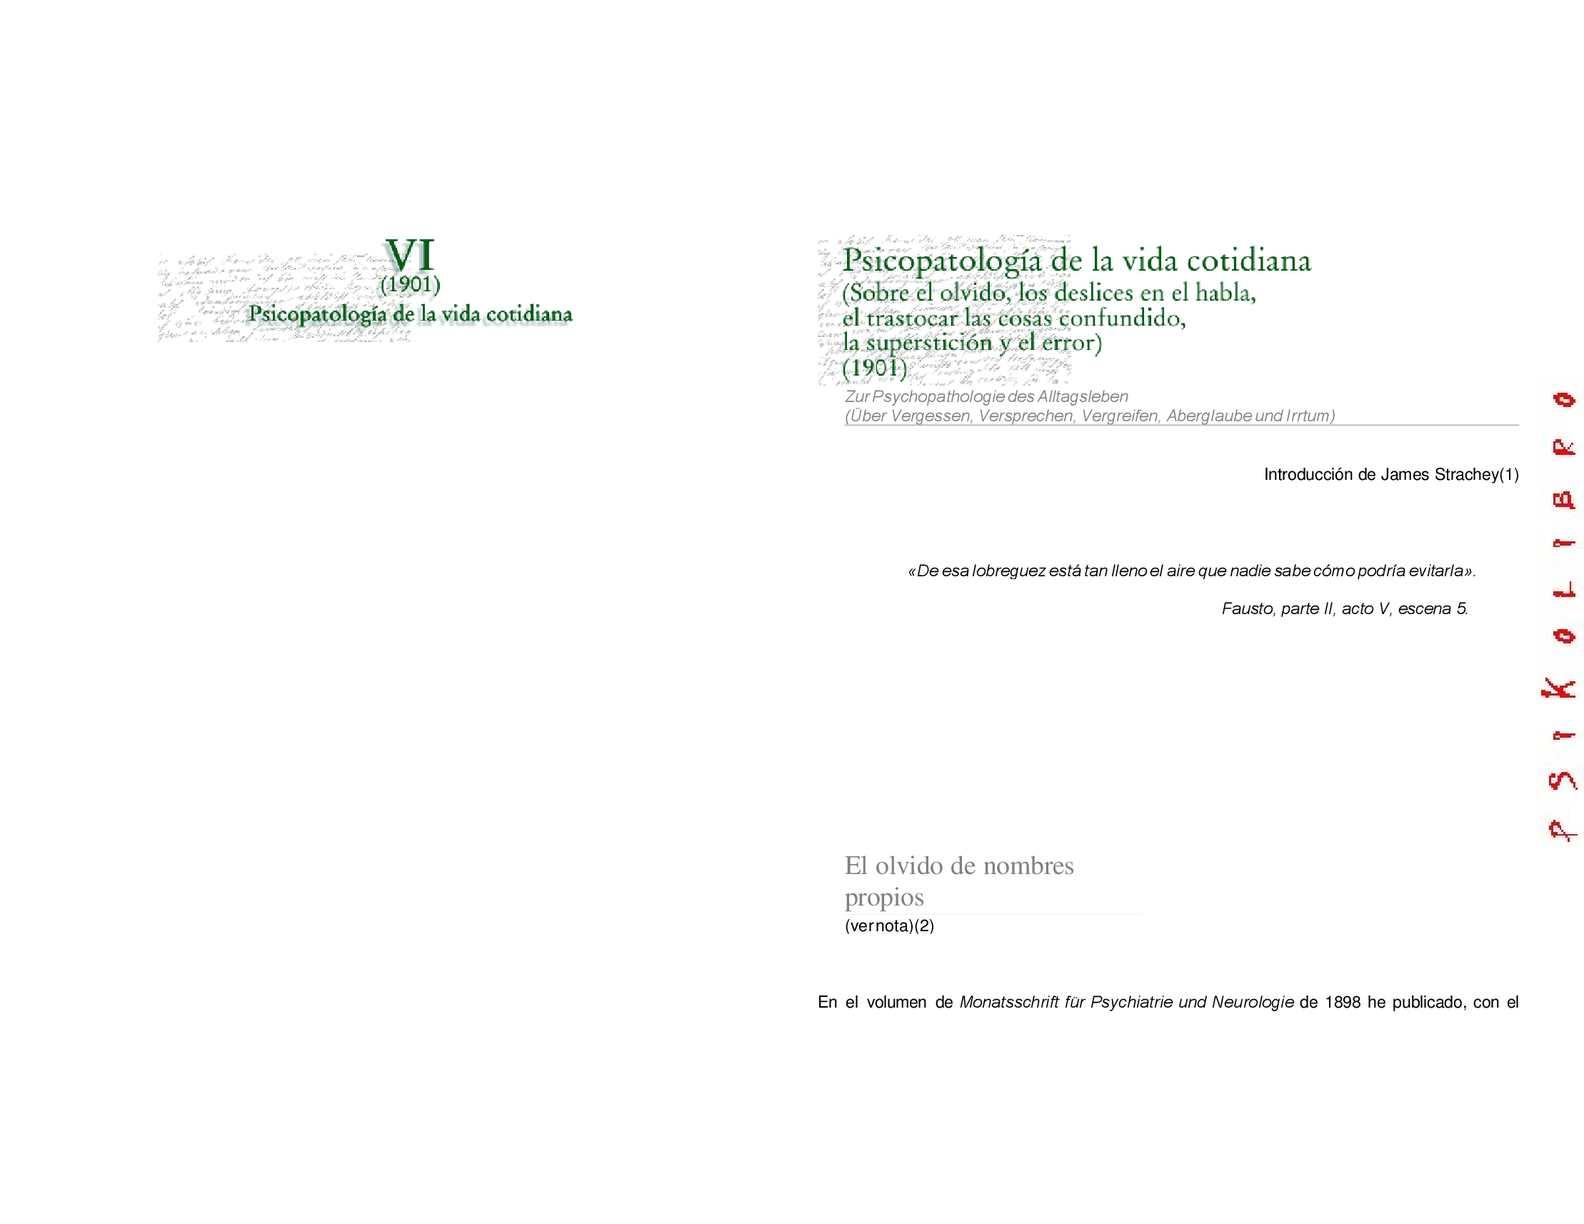 Calaméo - Psicopatologia_de_la_vida_cotidiana_VI_(1901)